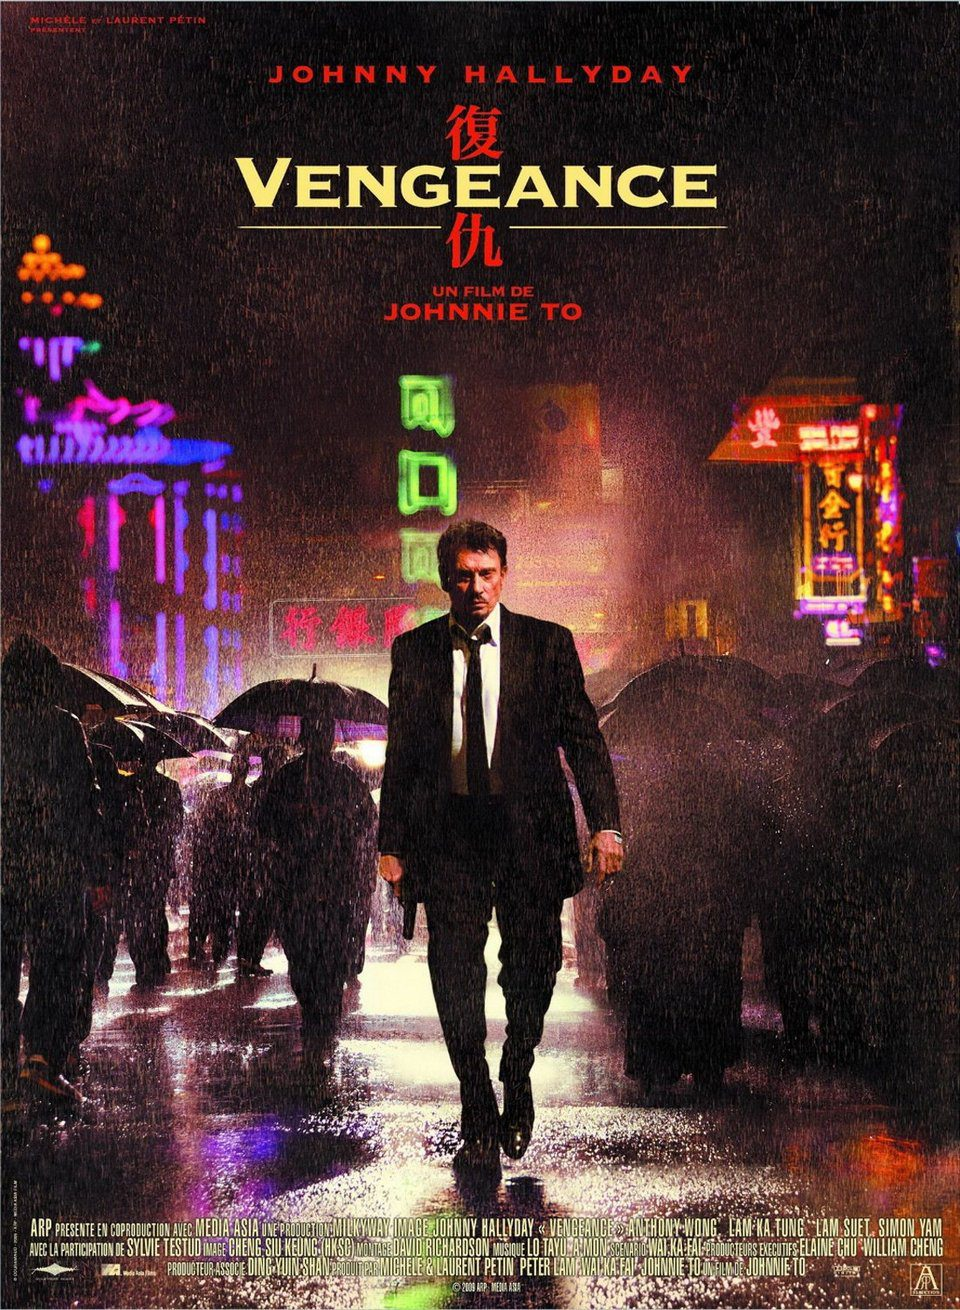 Cartel Francia de 'Vengeance'